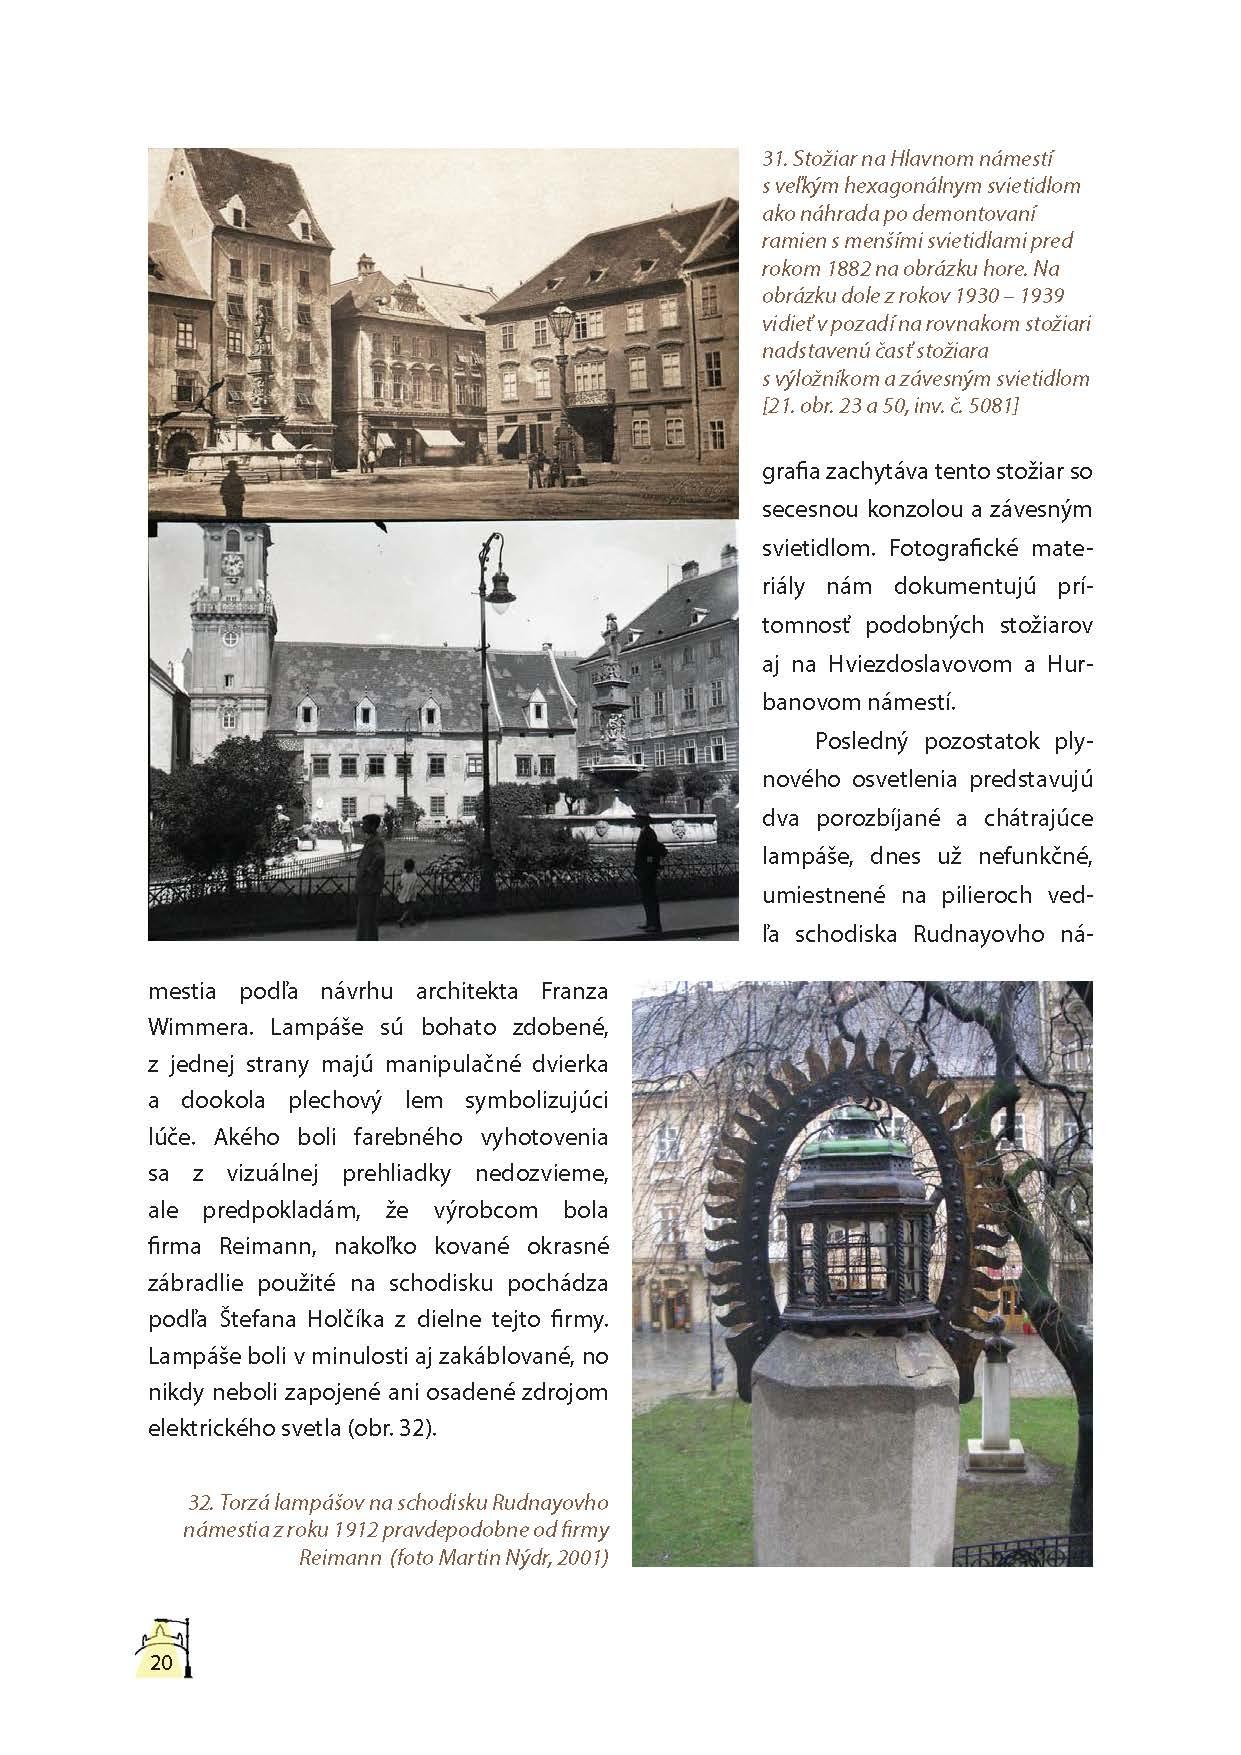 Lampy verejného osvetlenia v Bratislave 2